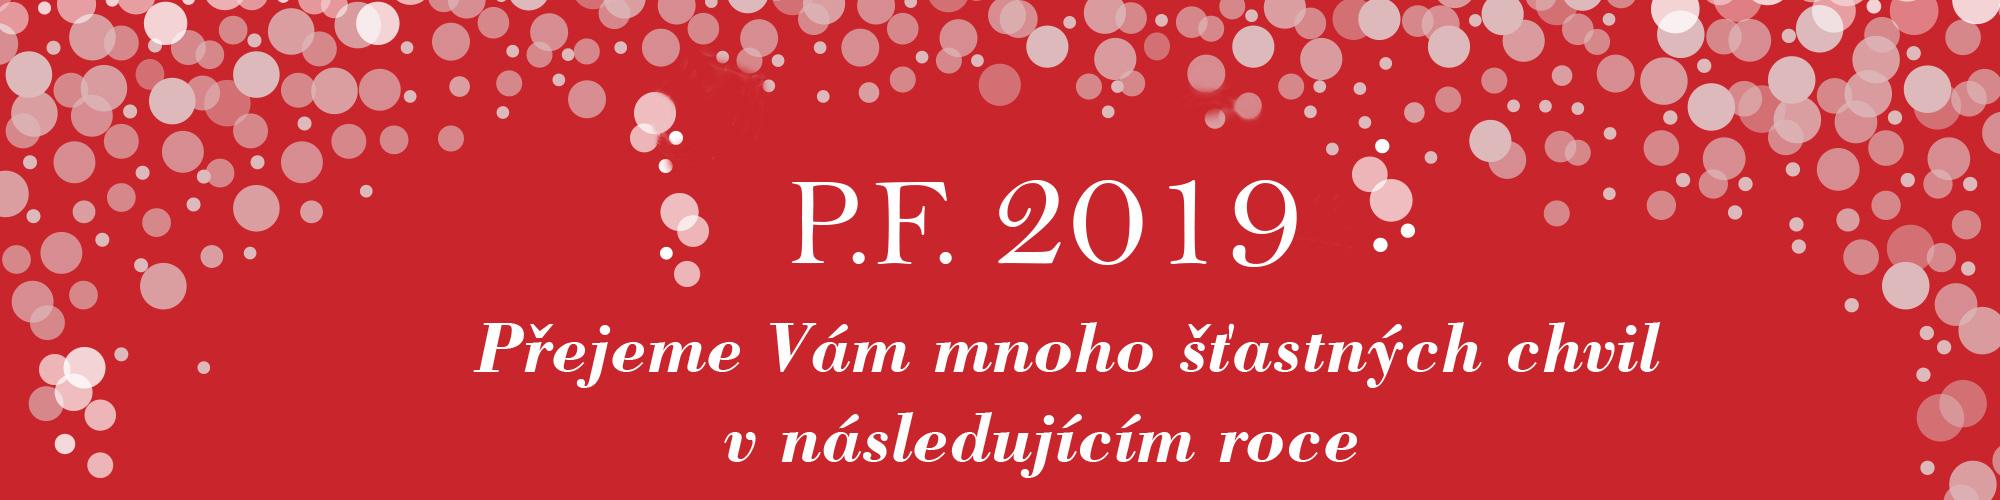 P.F.2019